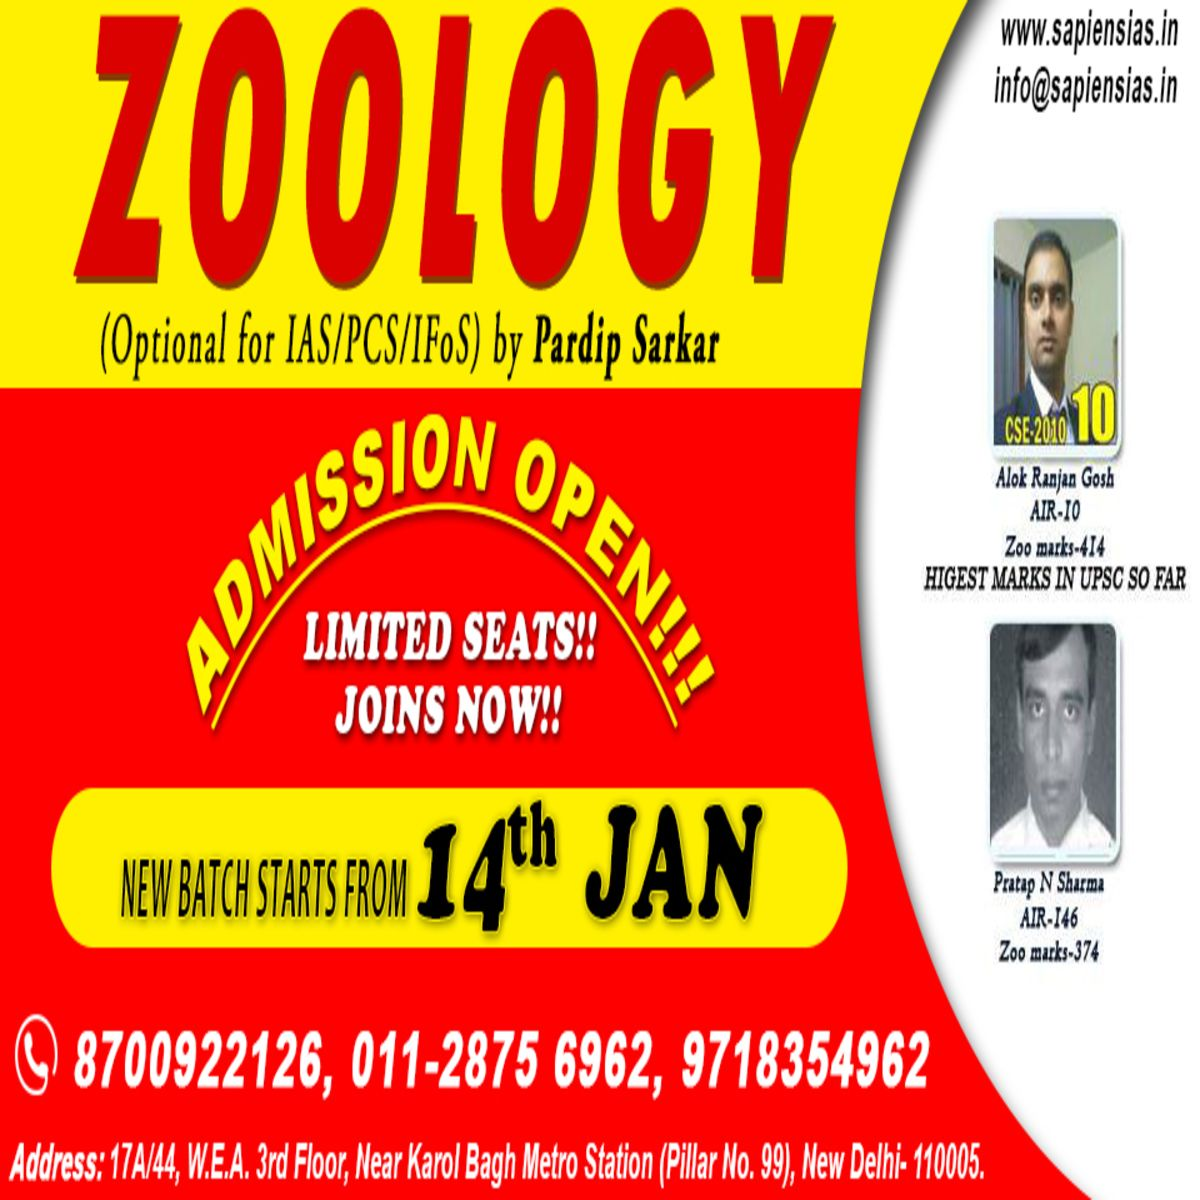 Zoology Optional for IAS/IFoS Zoology, Upsc civil